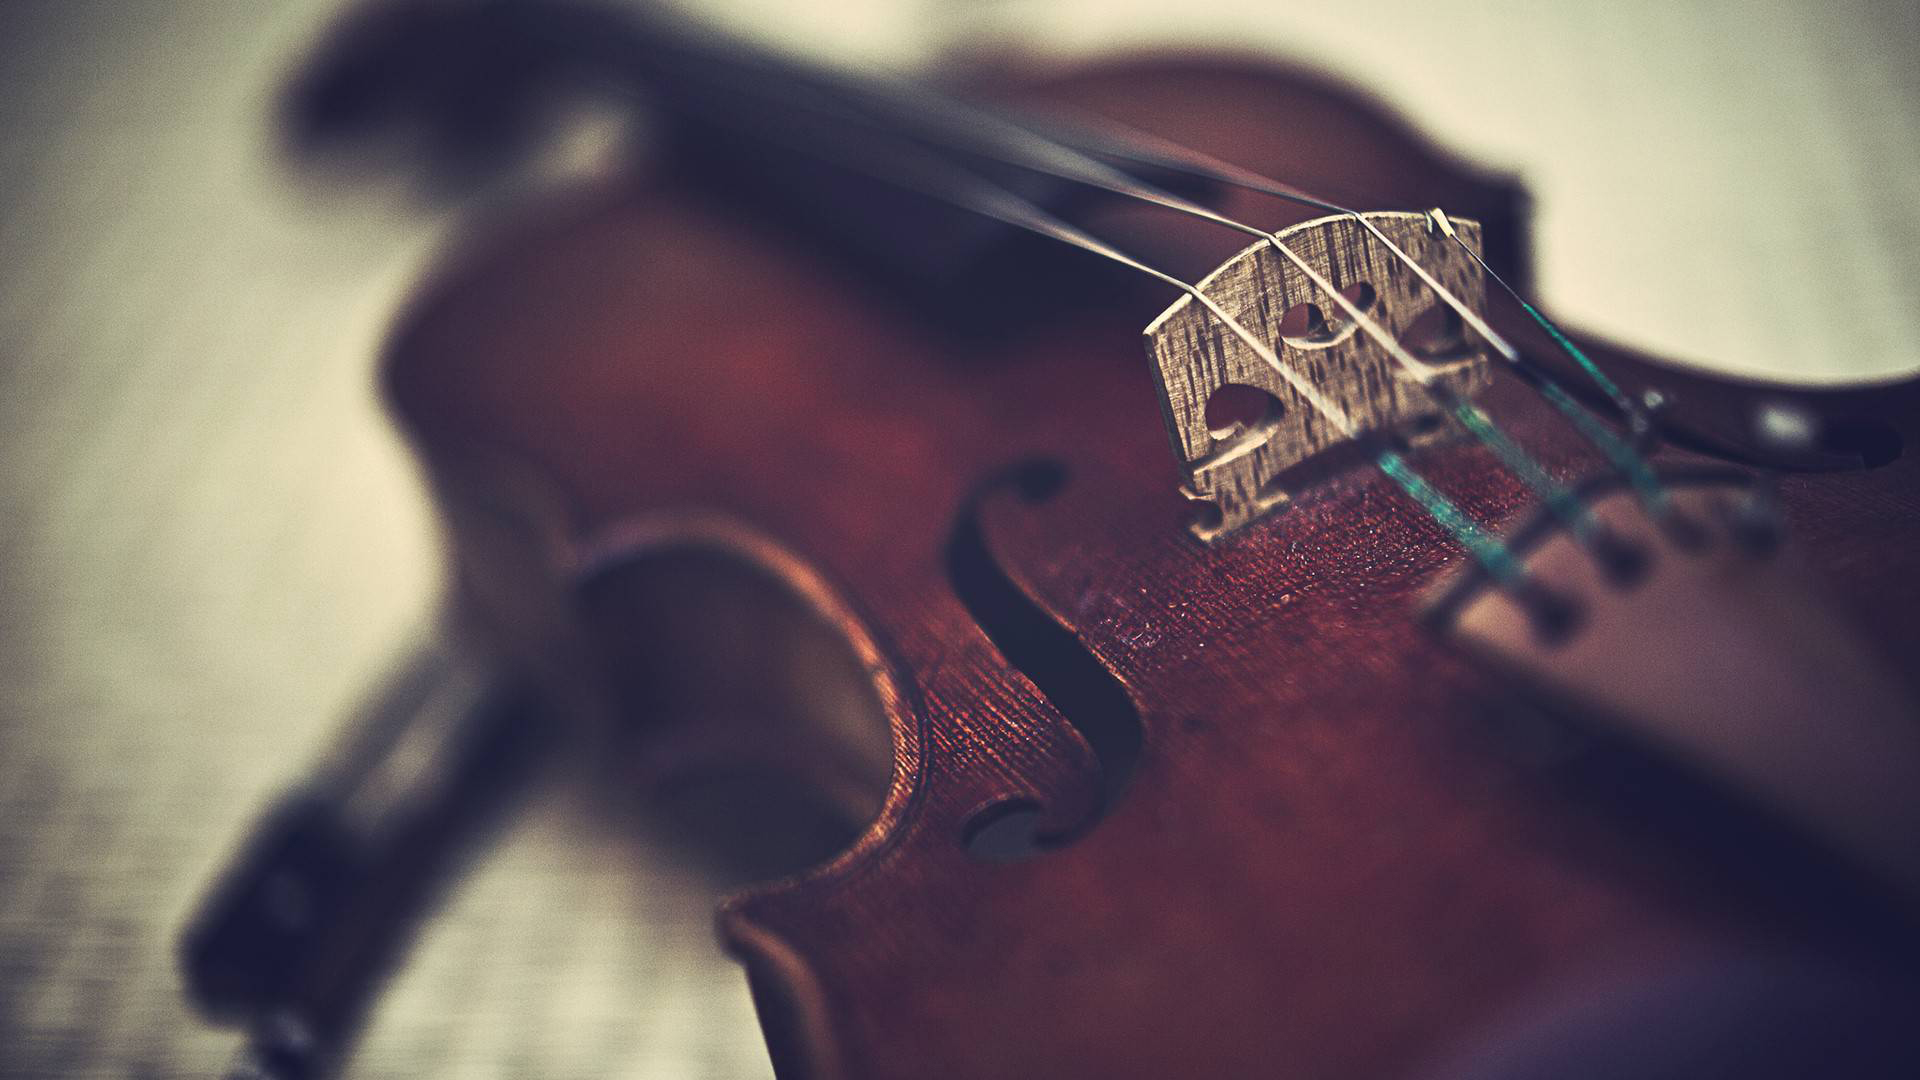 Violines para misas